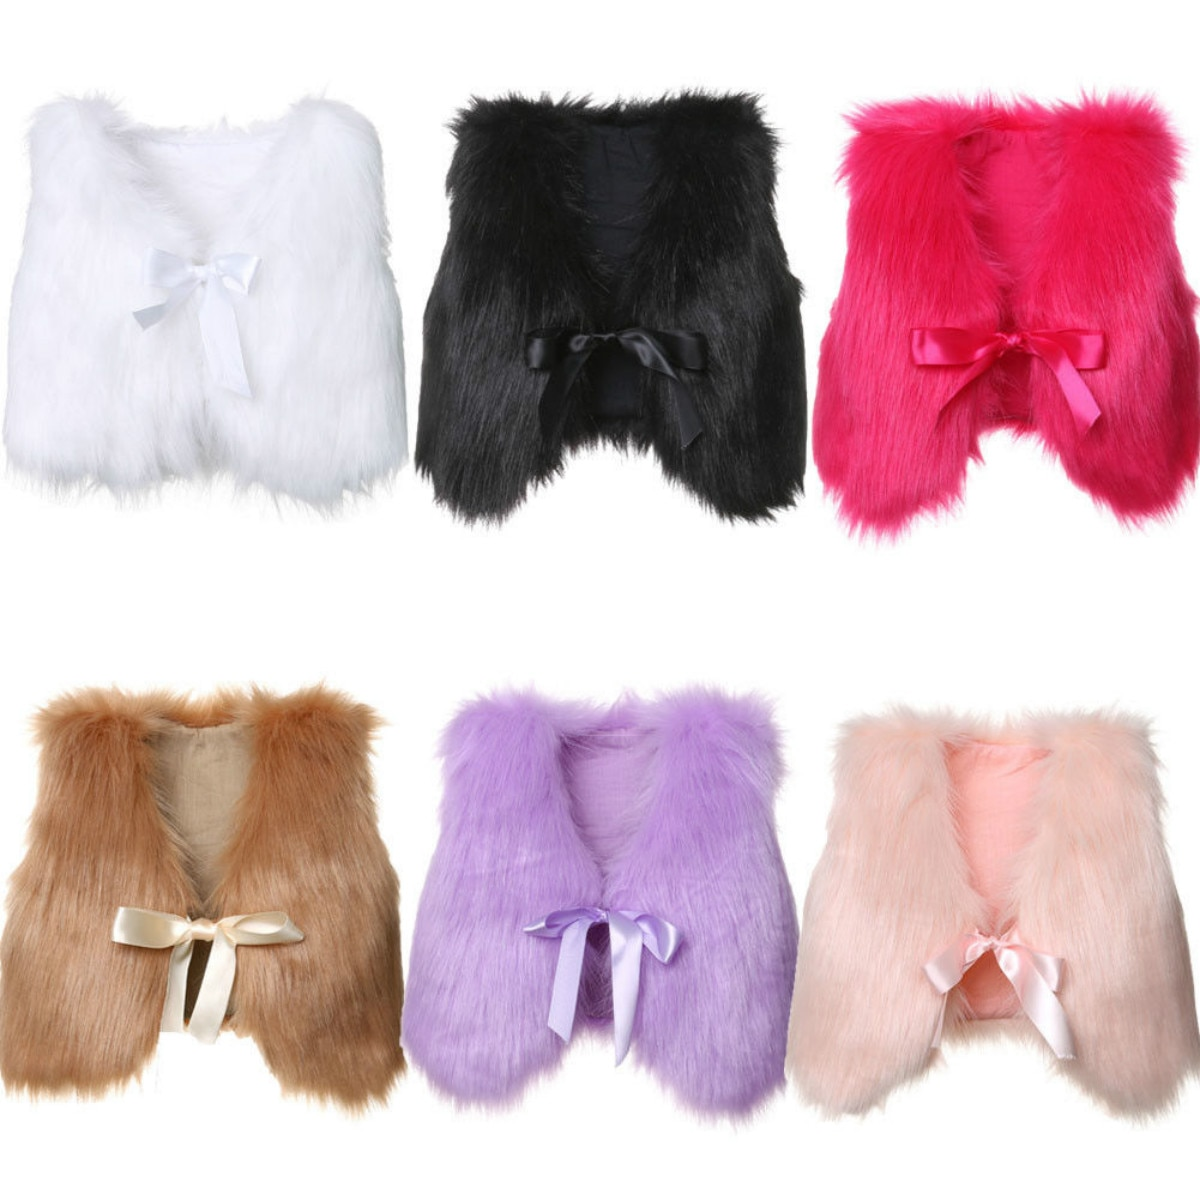 Bebé niños niñas Chaleco de piel sintética Chaleco de invierno cálido chaqueta abrigo ropa de exterior